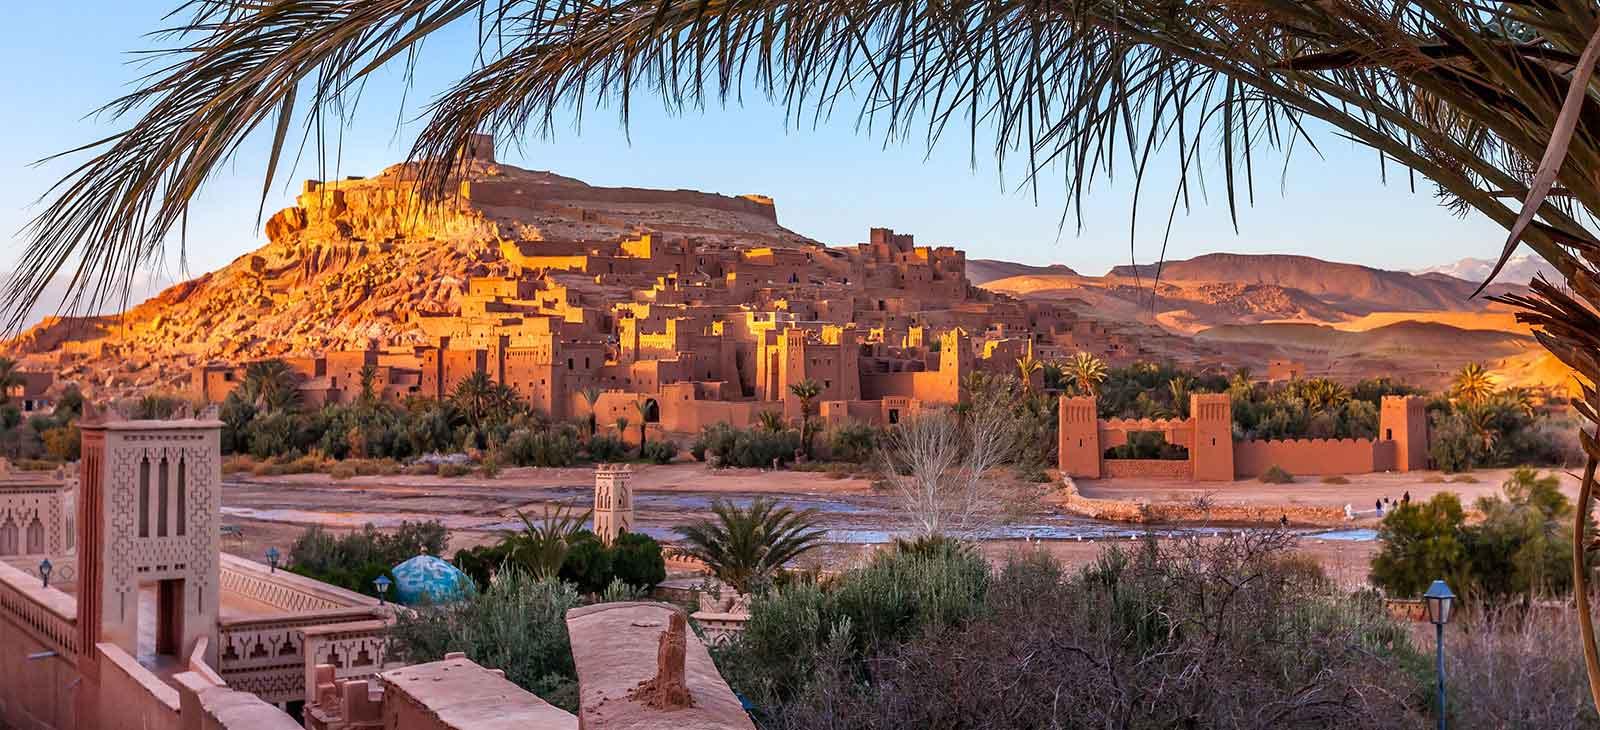 Private desert trips Marrakech